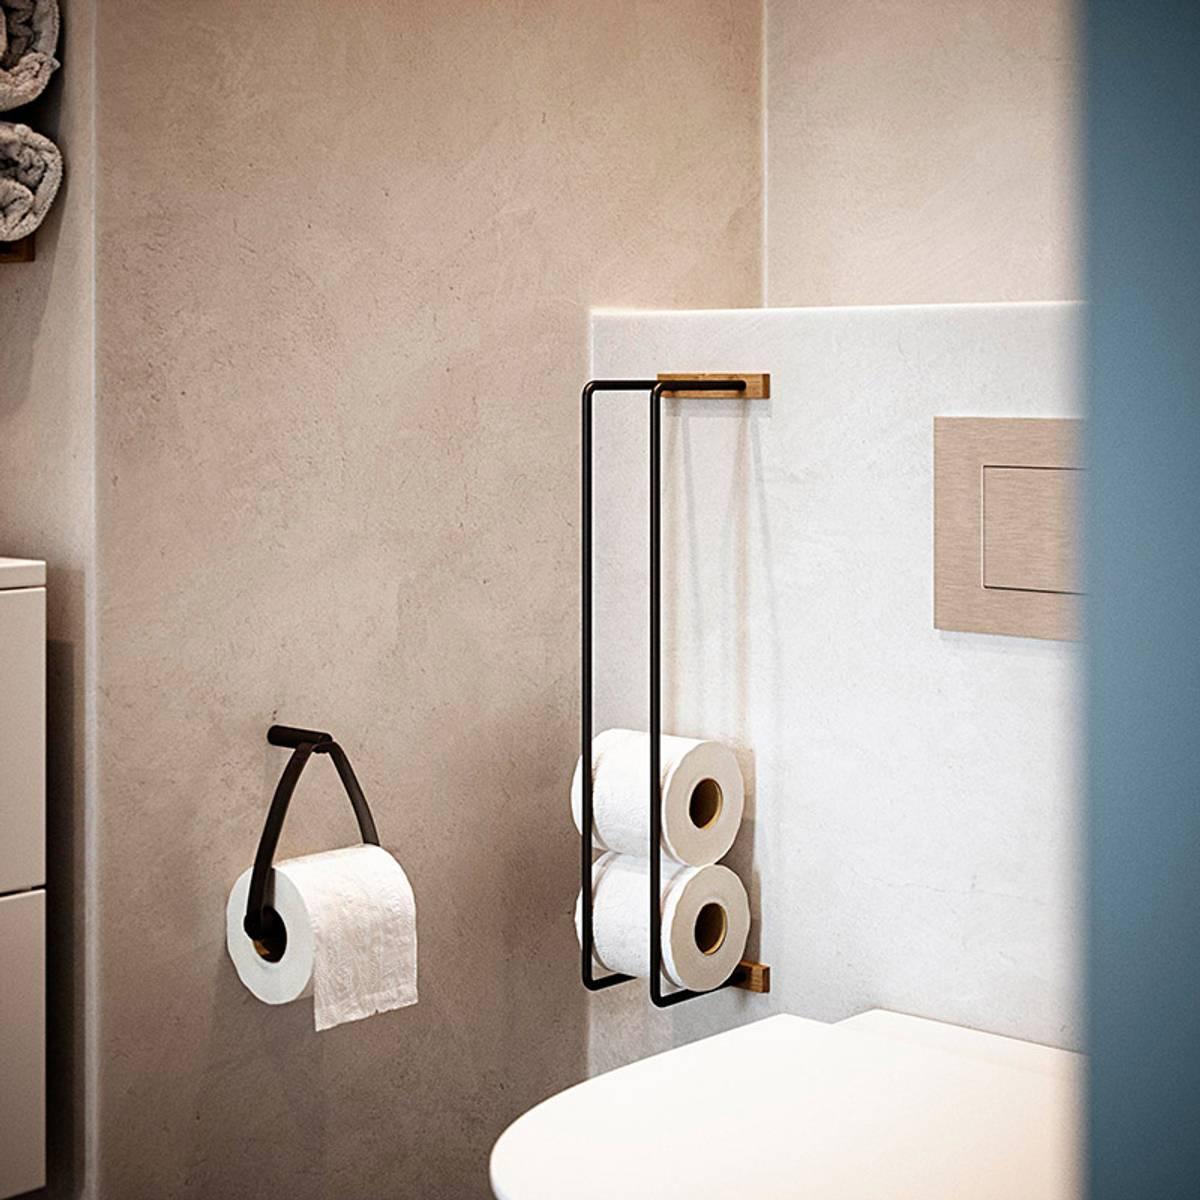 Bathroom Rack Natur - By Wirth